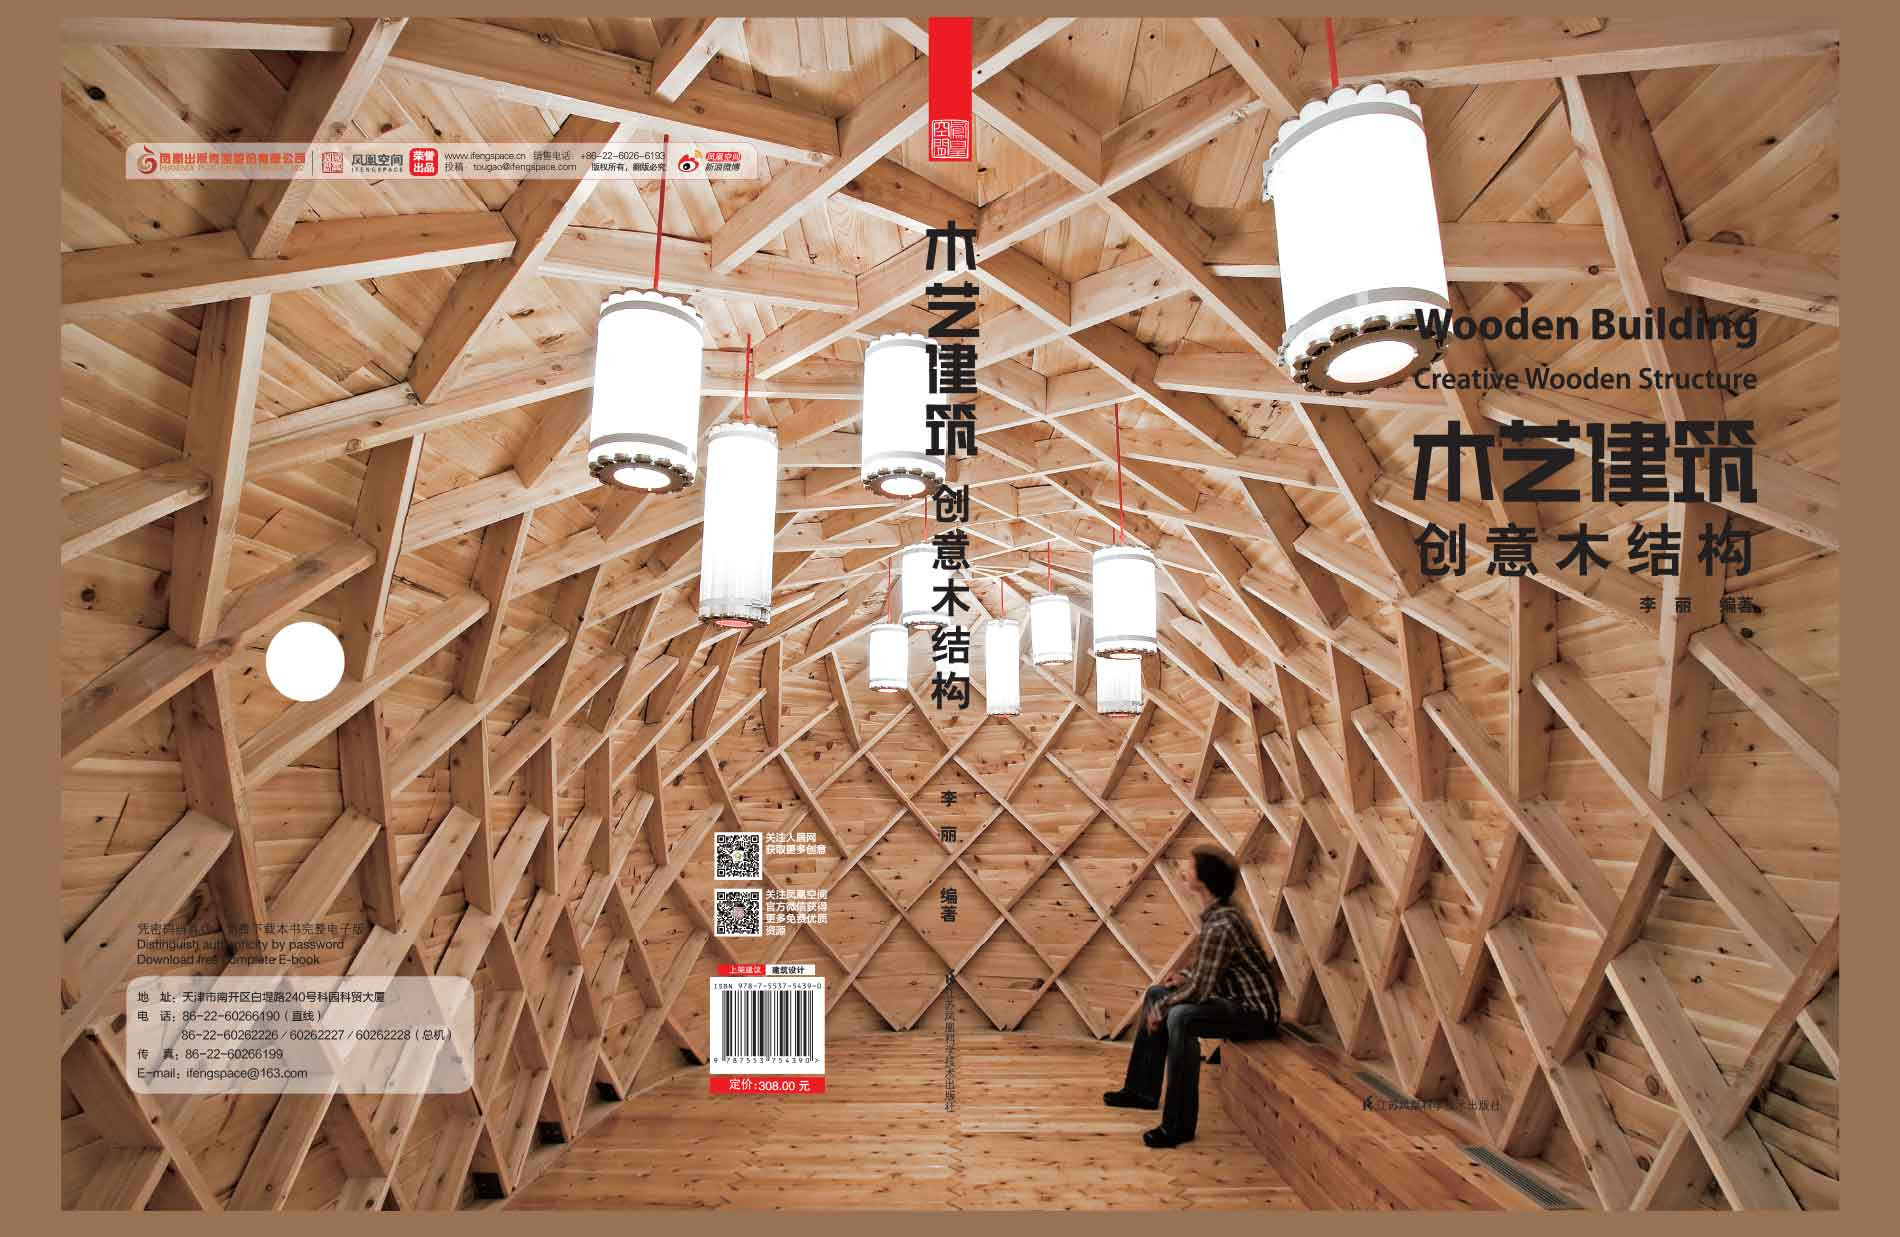 Wooden Building Book: Creative Wooden Structure - Bowmont Gardens ...